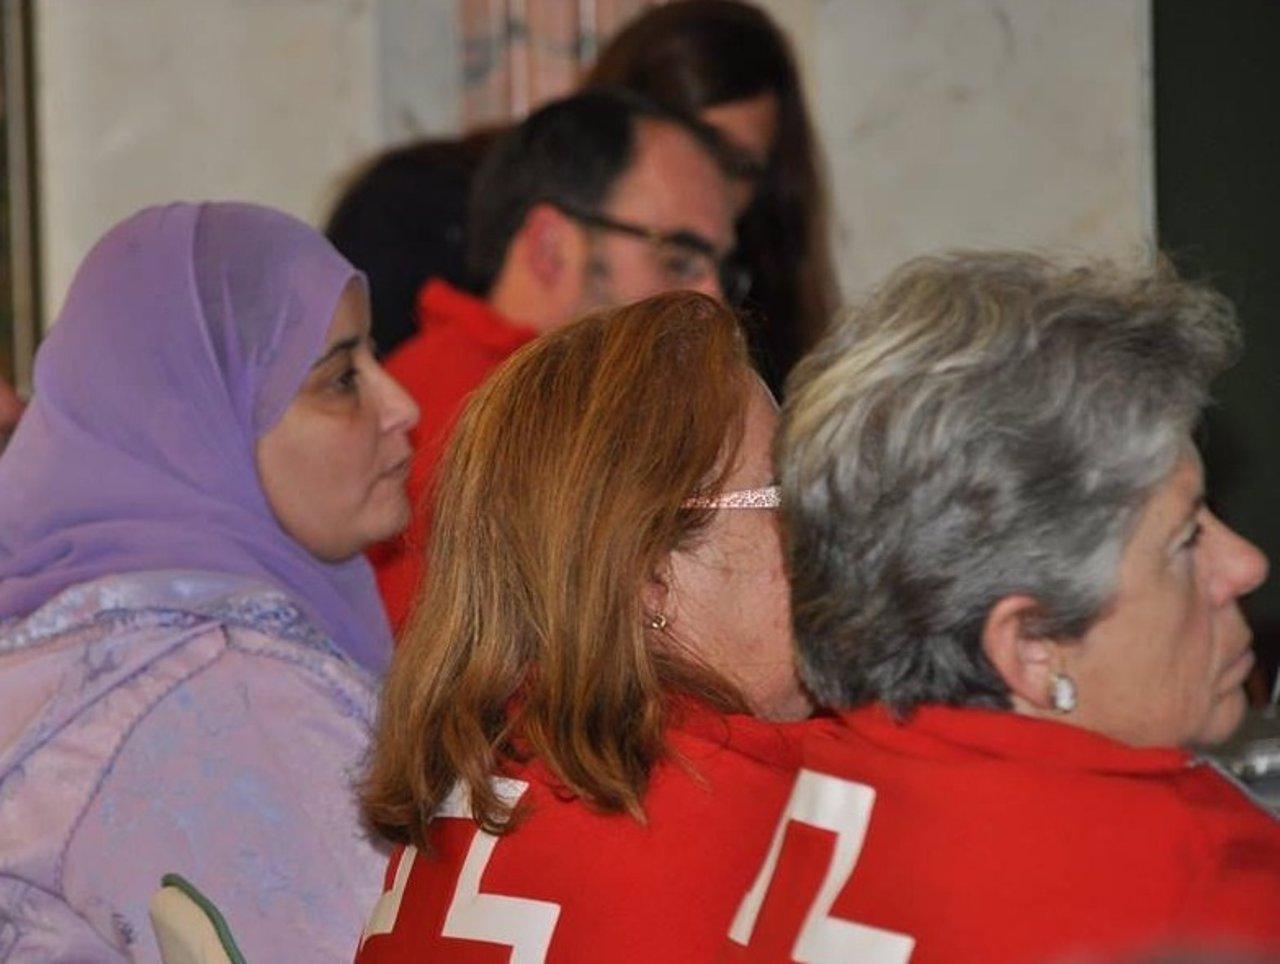 Mujeres atendidas cruz roja vulnerables vulnerabilidad